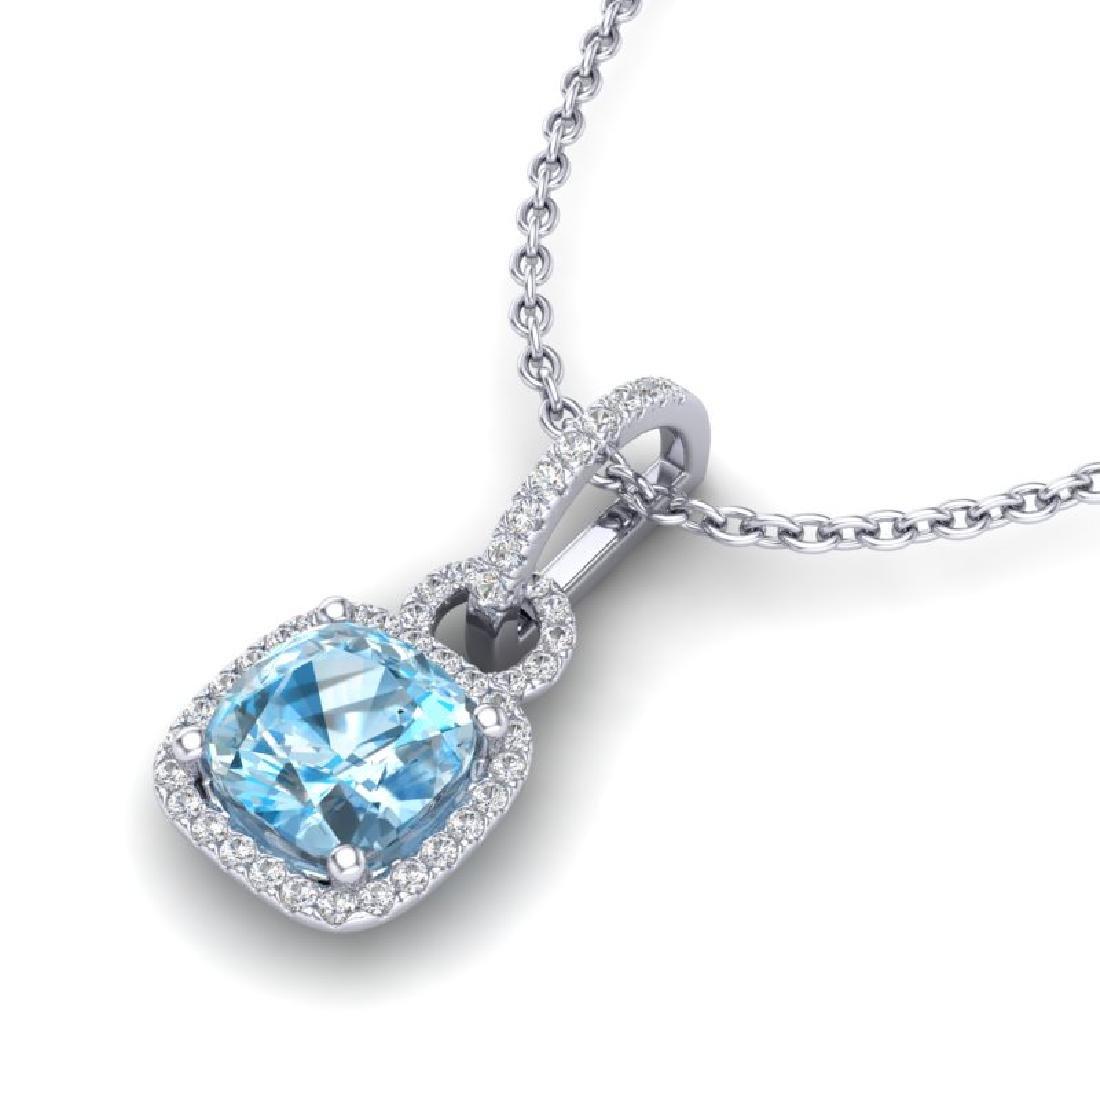 3.50 CTW Topaz & Micro VS/SI Diamond Necklace 18K White